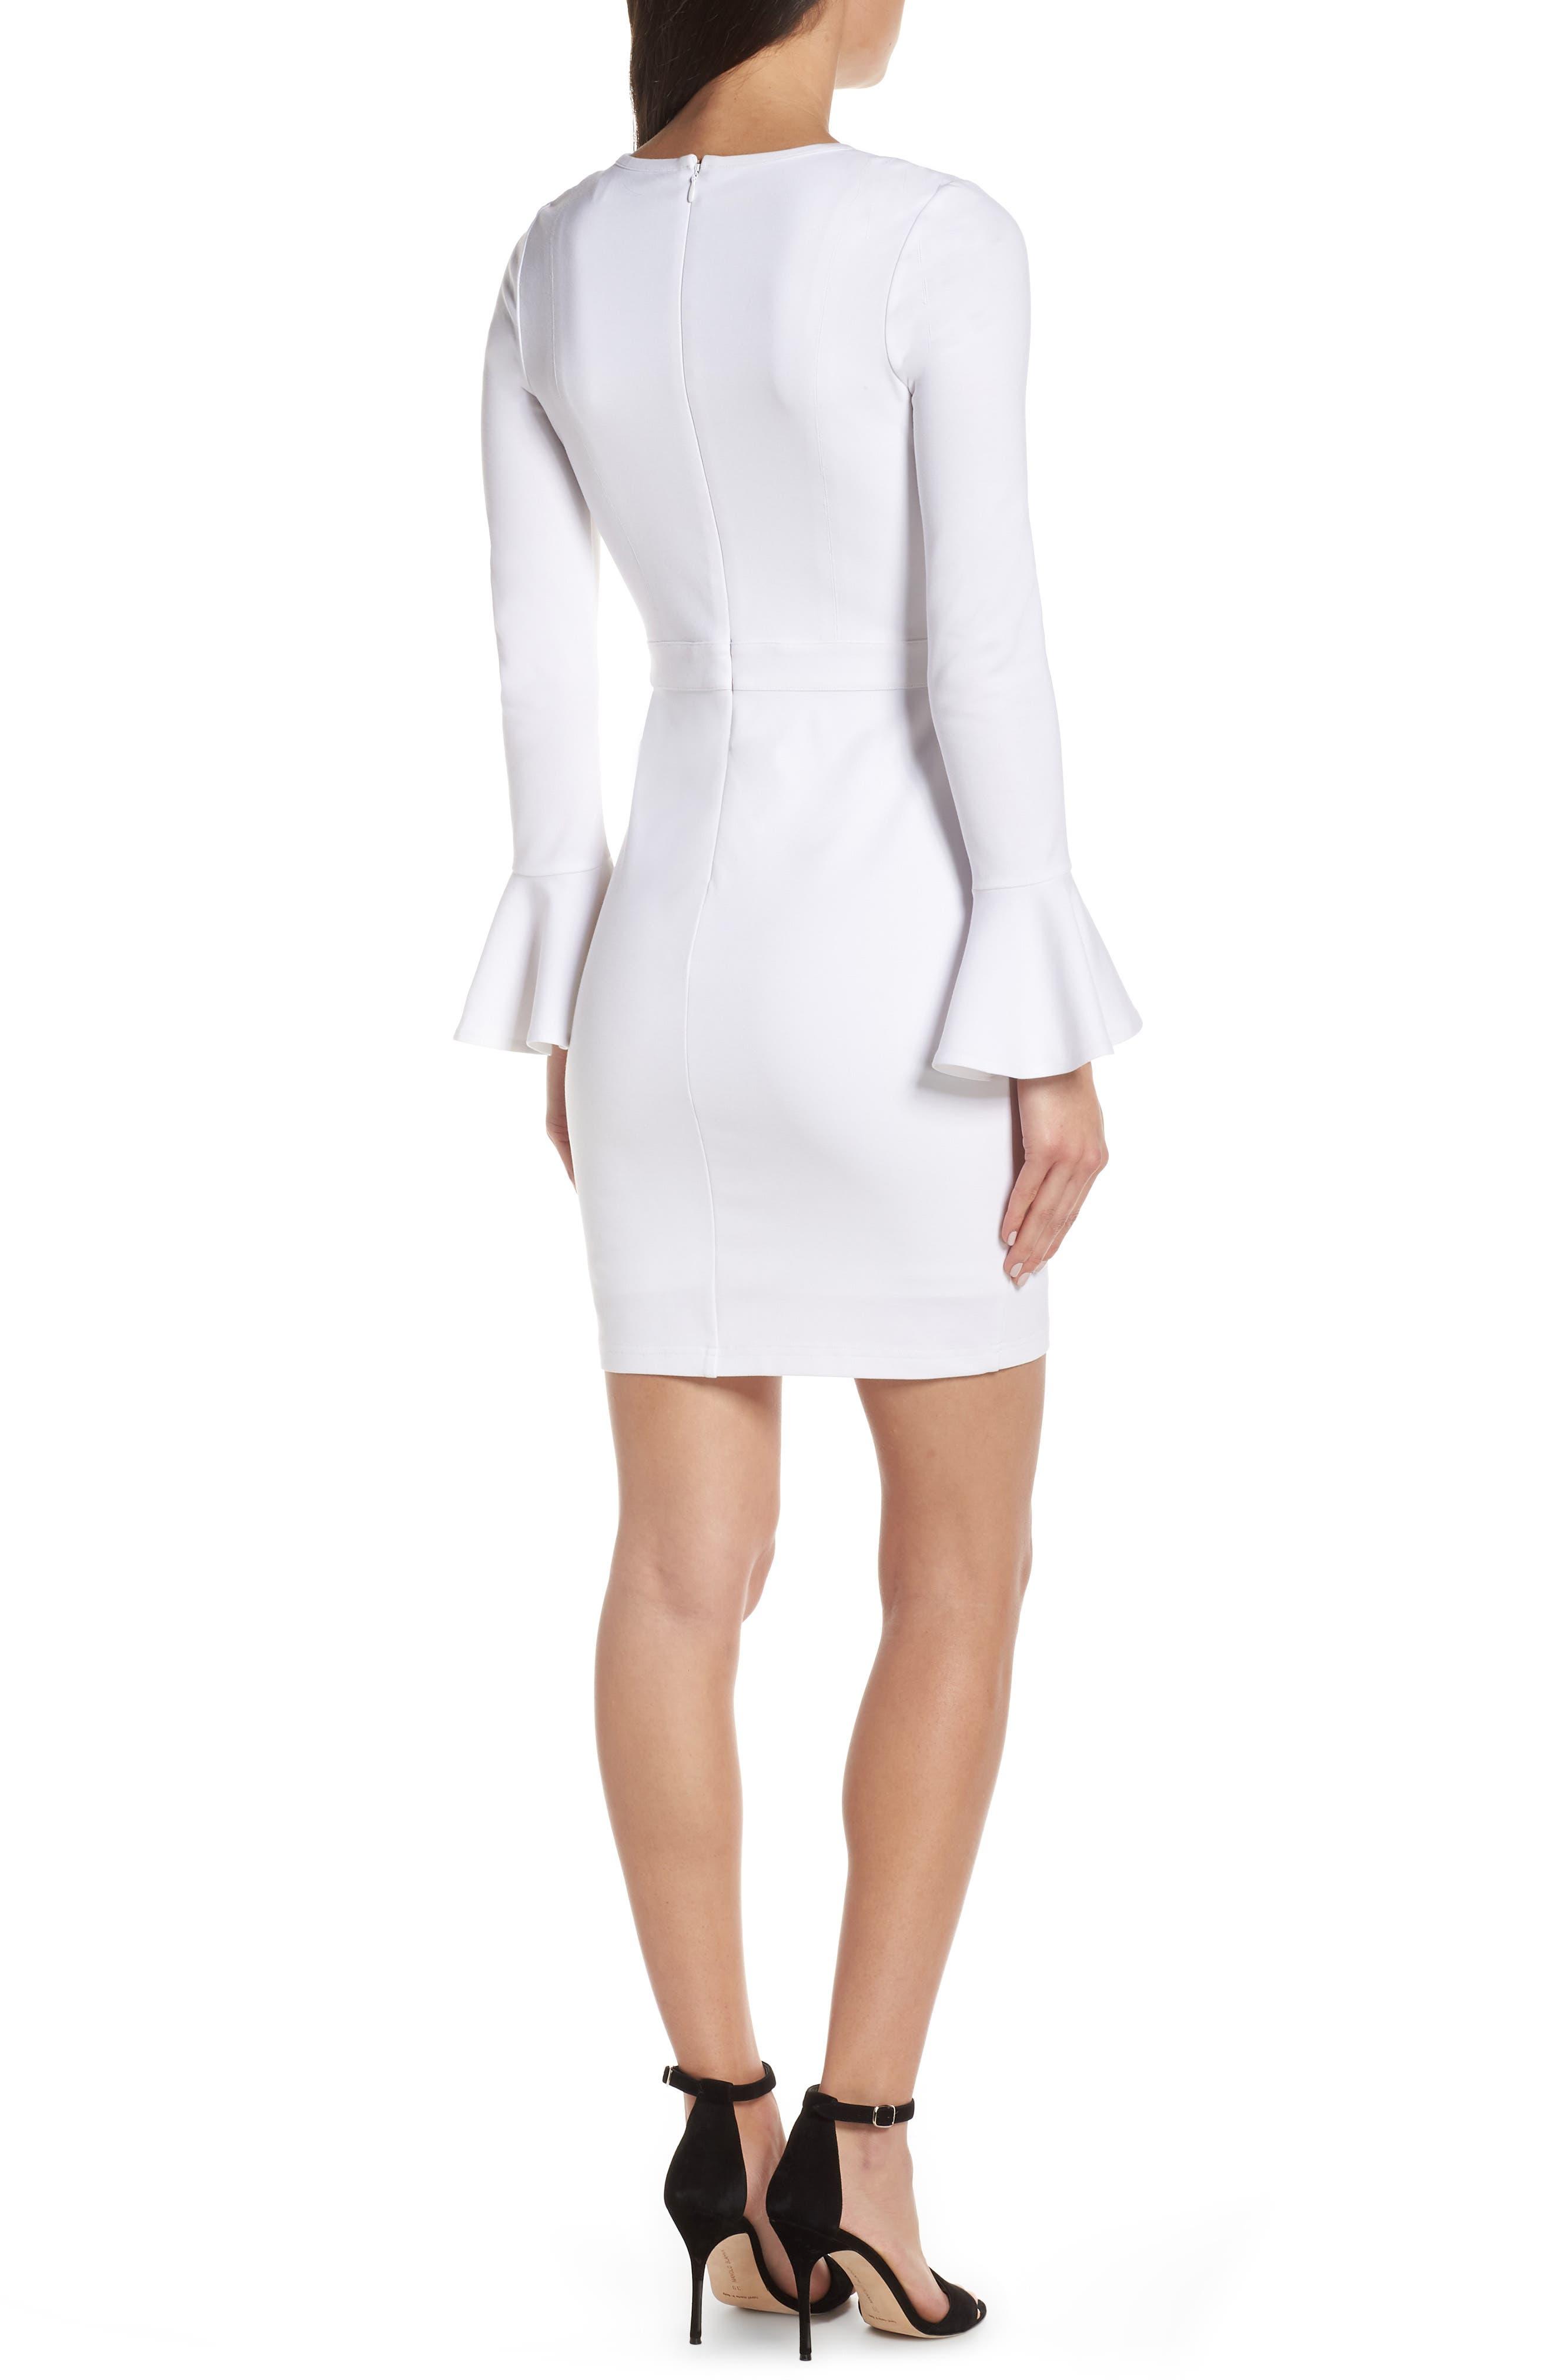 ALI & JAY, Pavillion Bell Cuff Sheath Dress, Alternate thumbnail 2, color, WHITE